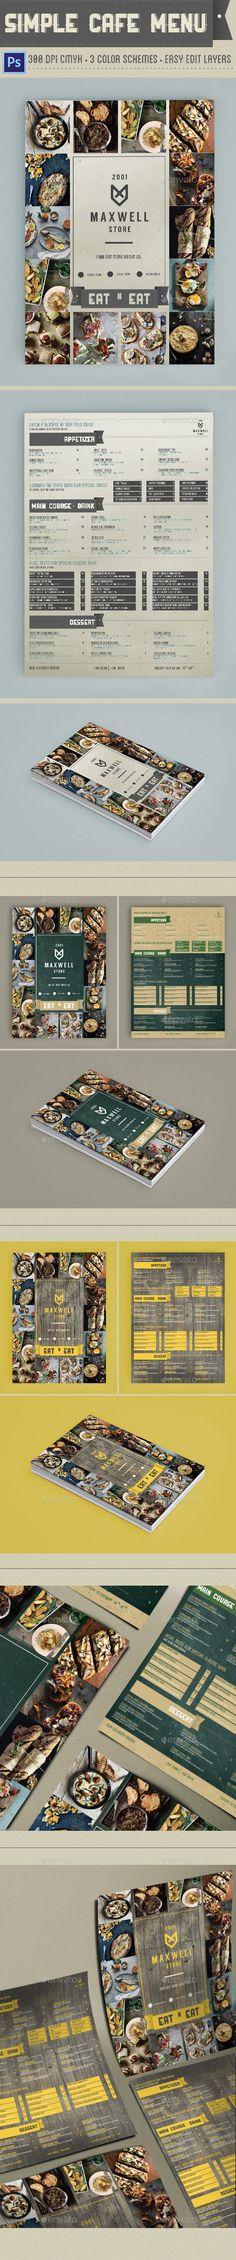 Simple Cafe Menu Template #design Download: http://graphicriver.net/item/simple-cafe-menu/12418396?ref=ksioks